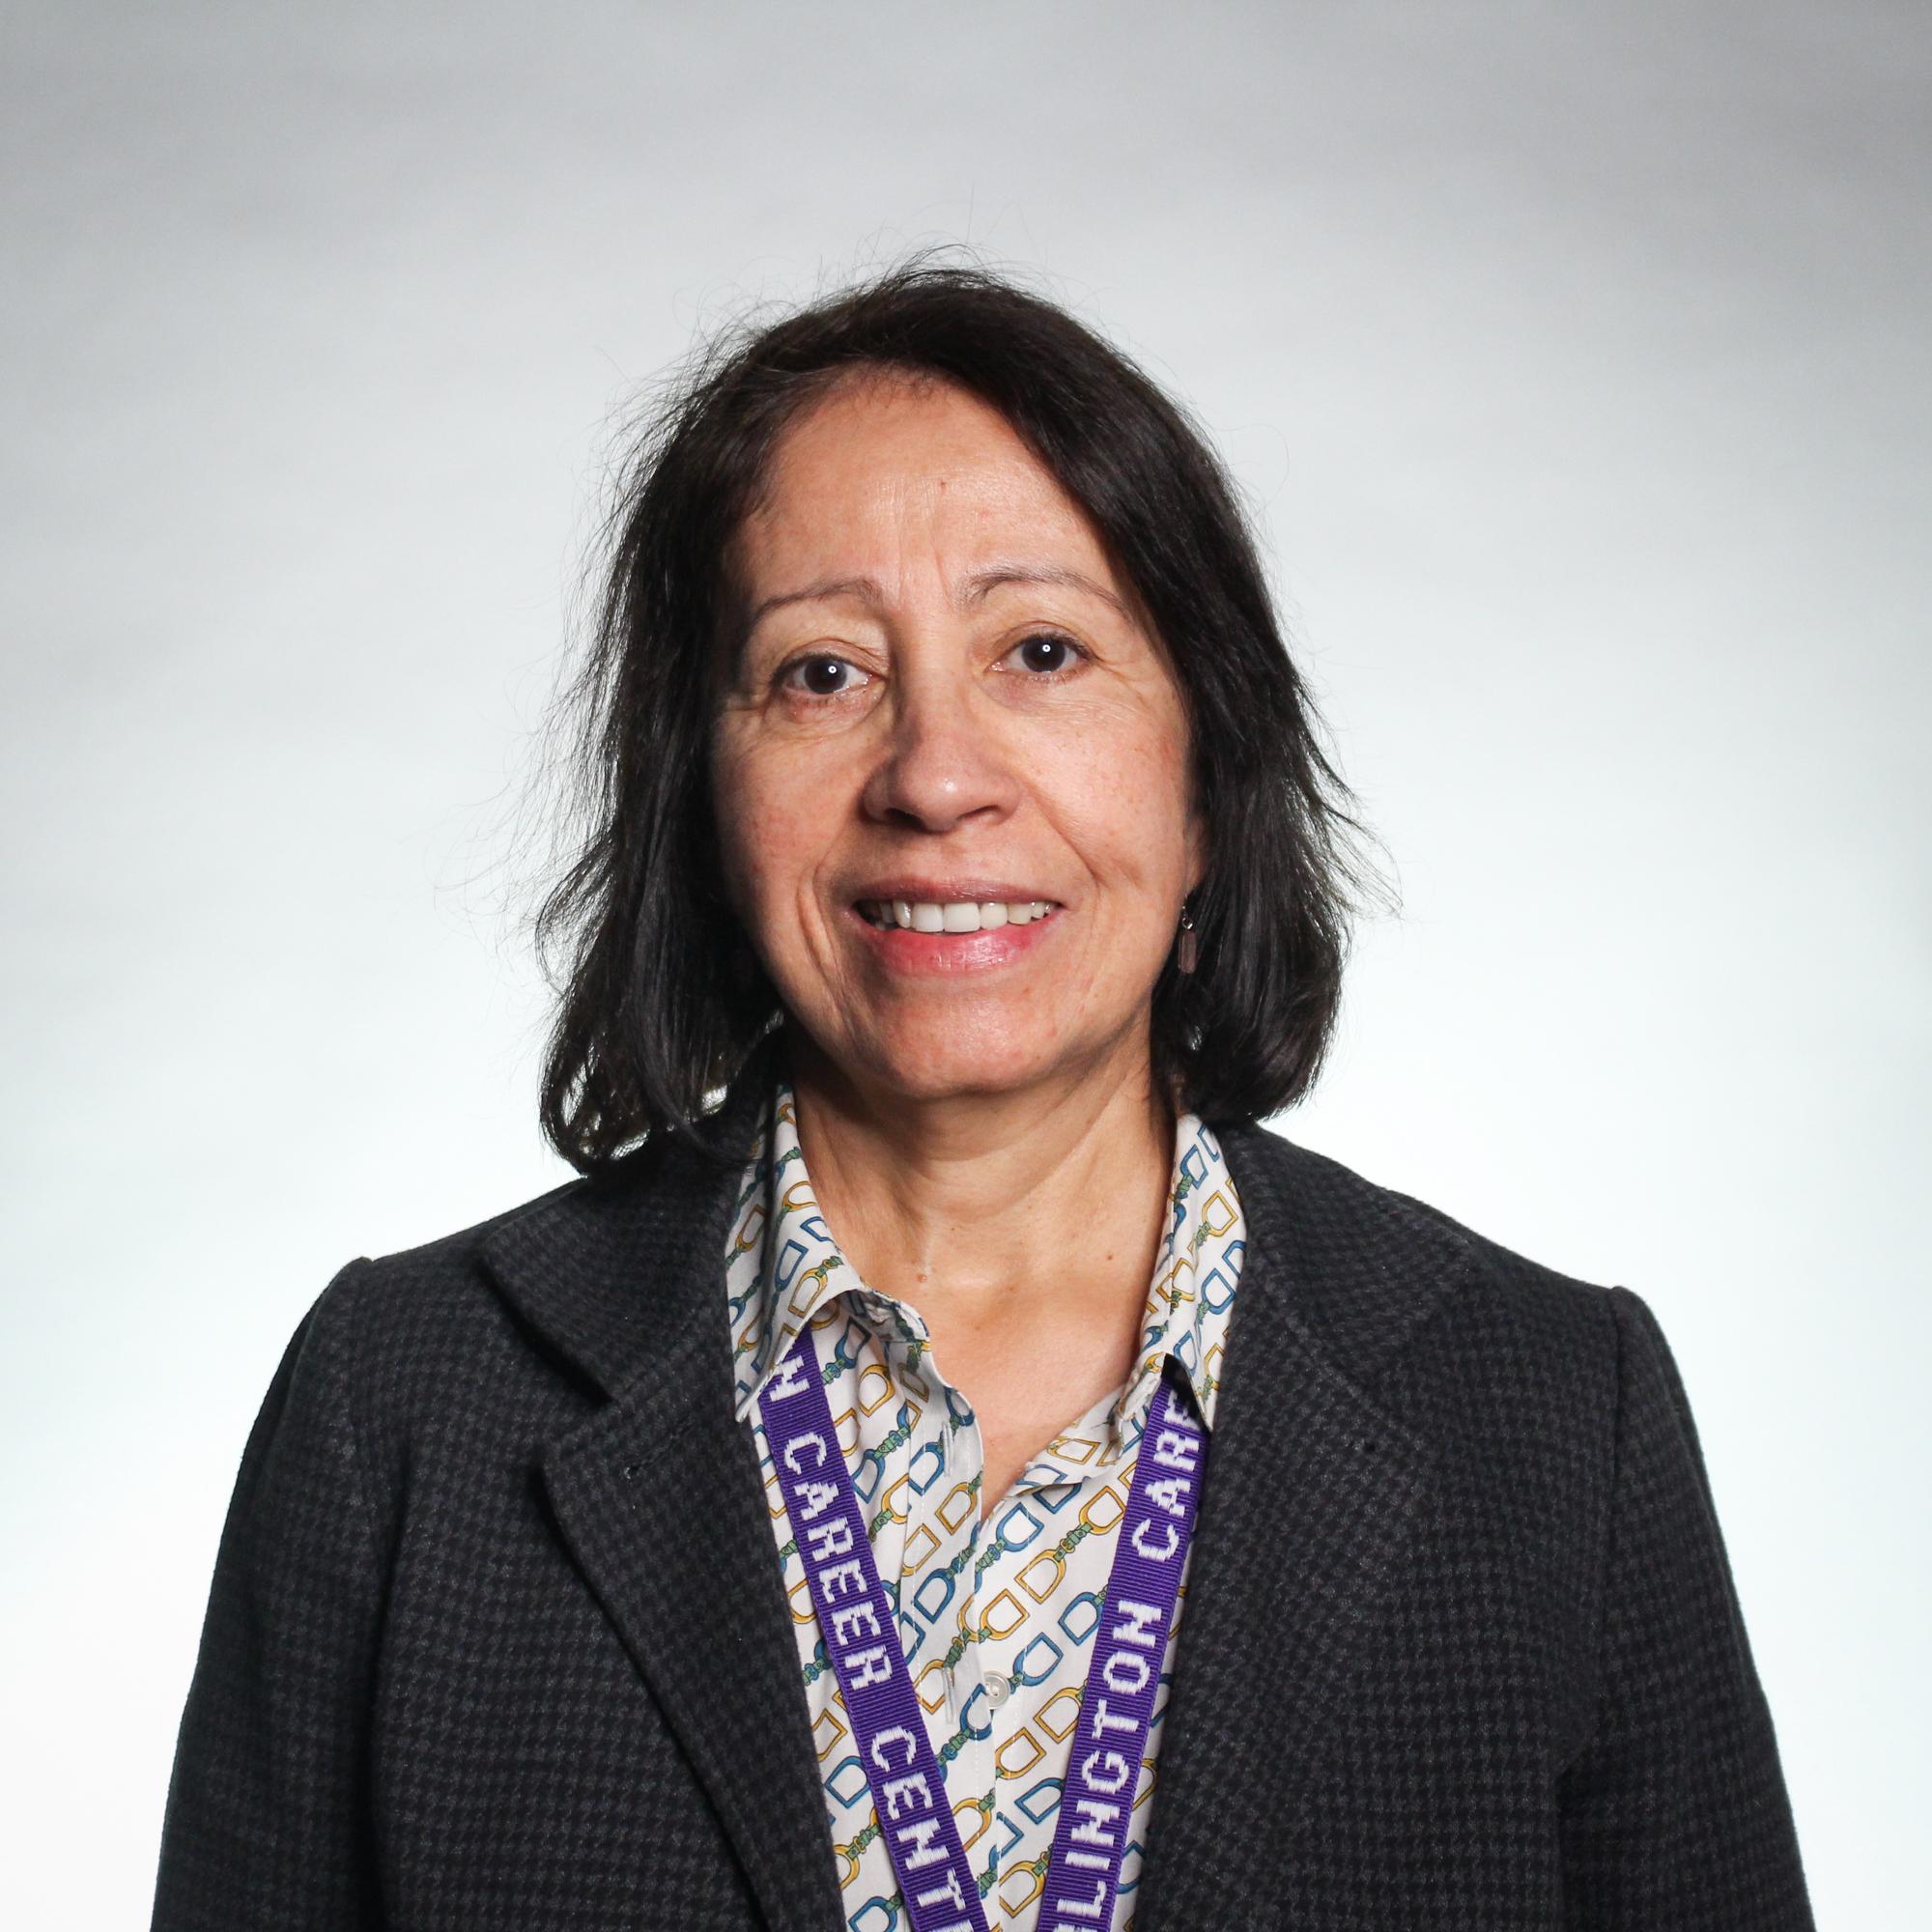 Mrs. Maria Sonnekalb